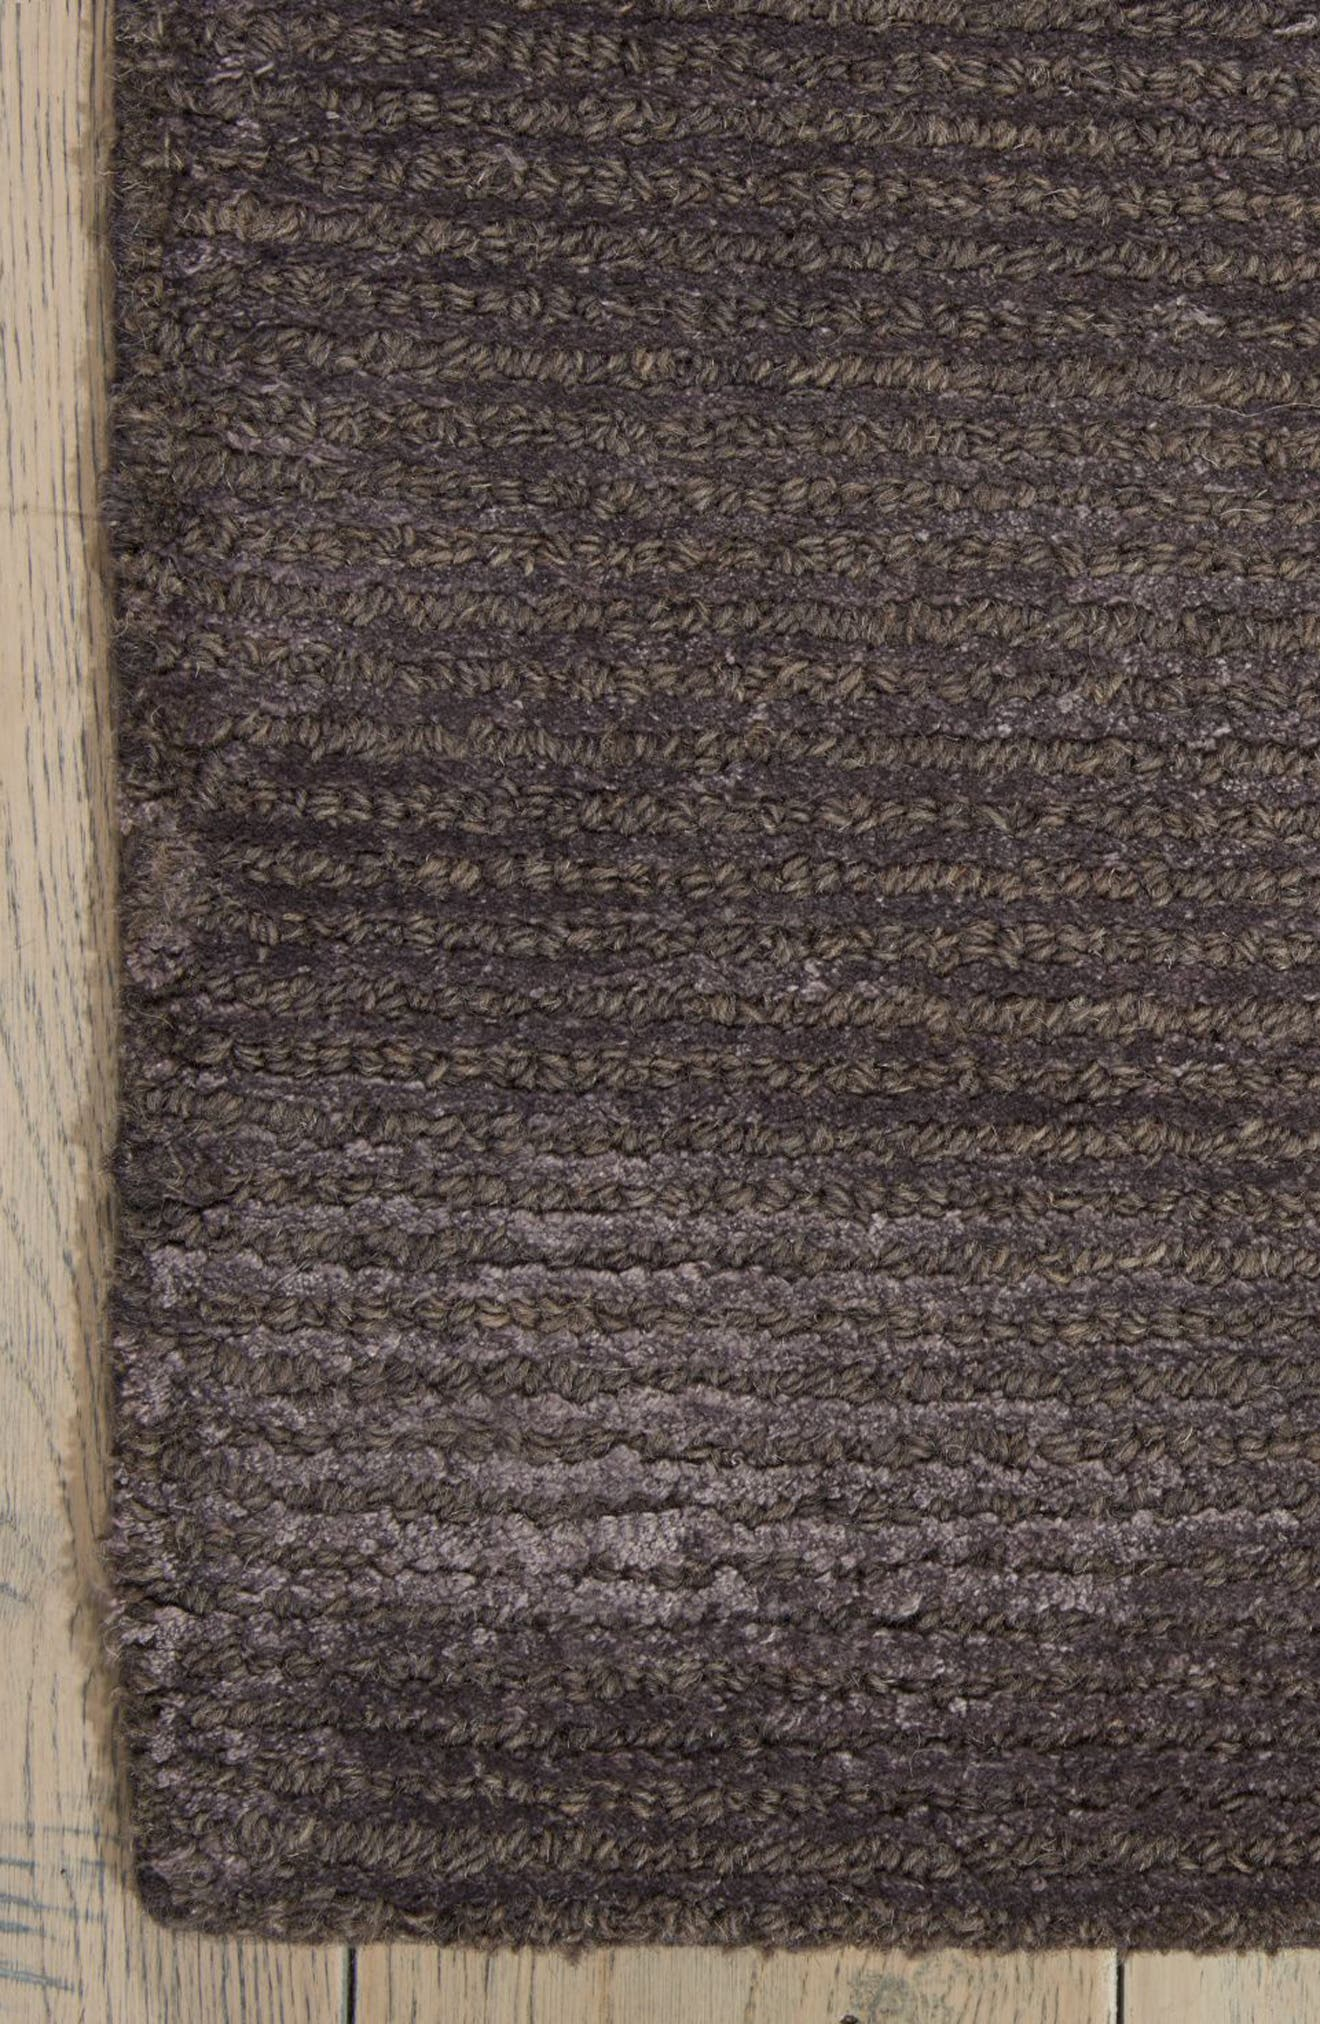 Ravine Furrow Handwoven Area Rug,                             Alternate thumbnail 7, color,                             001